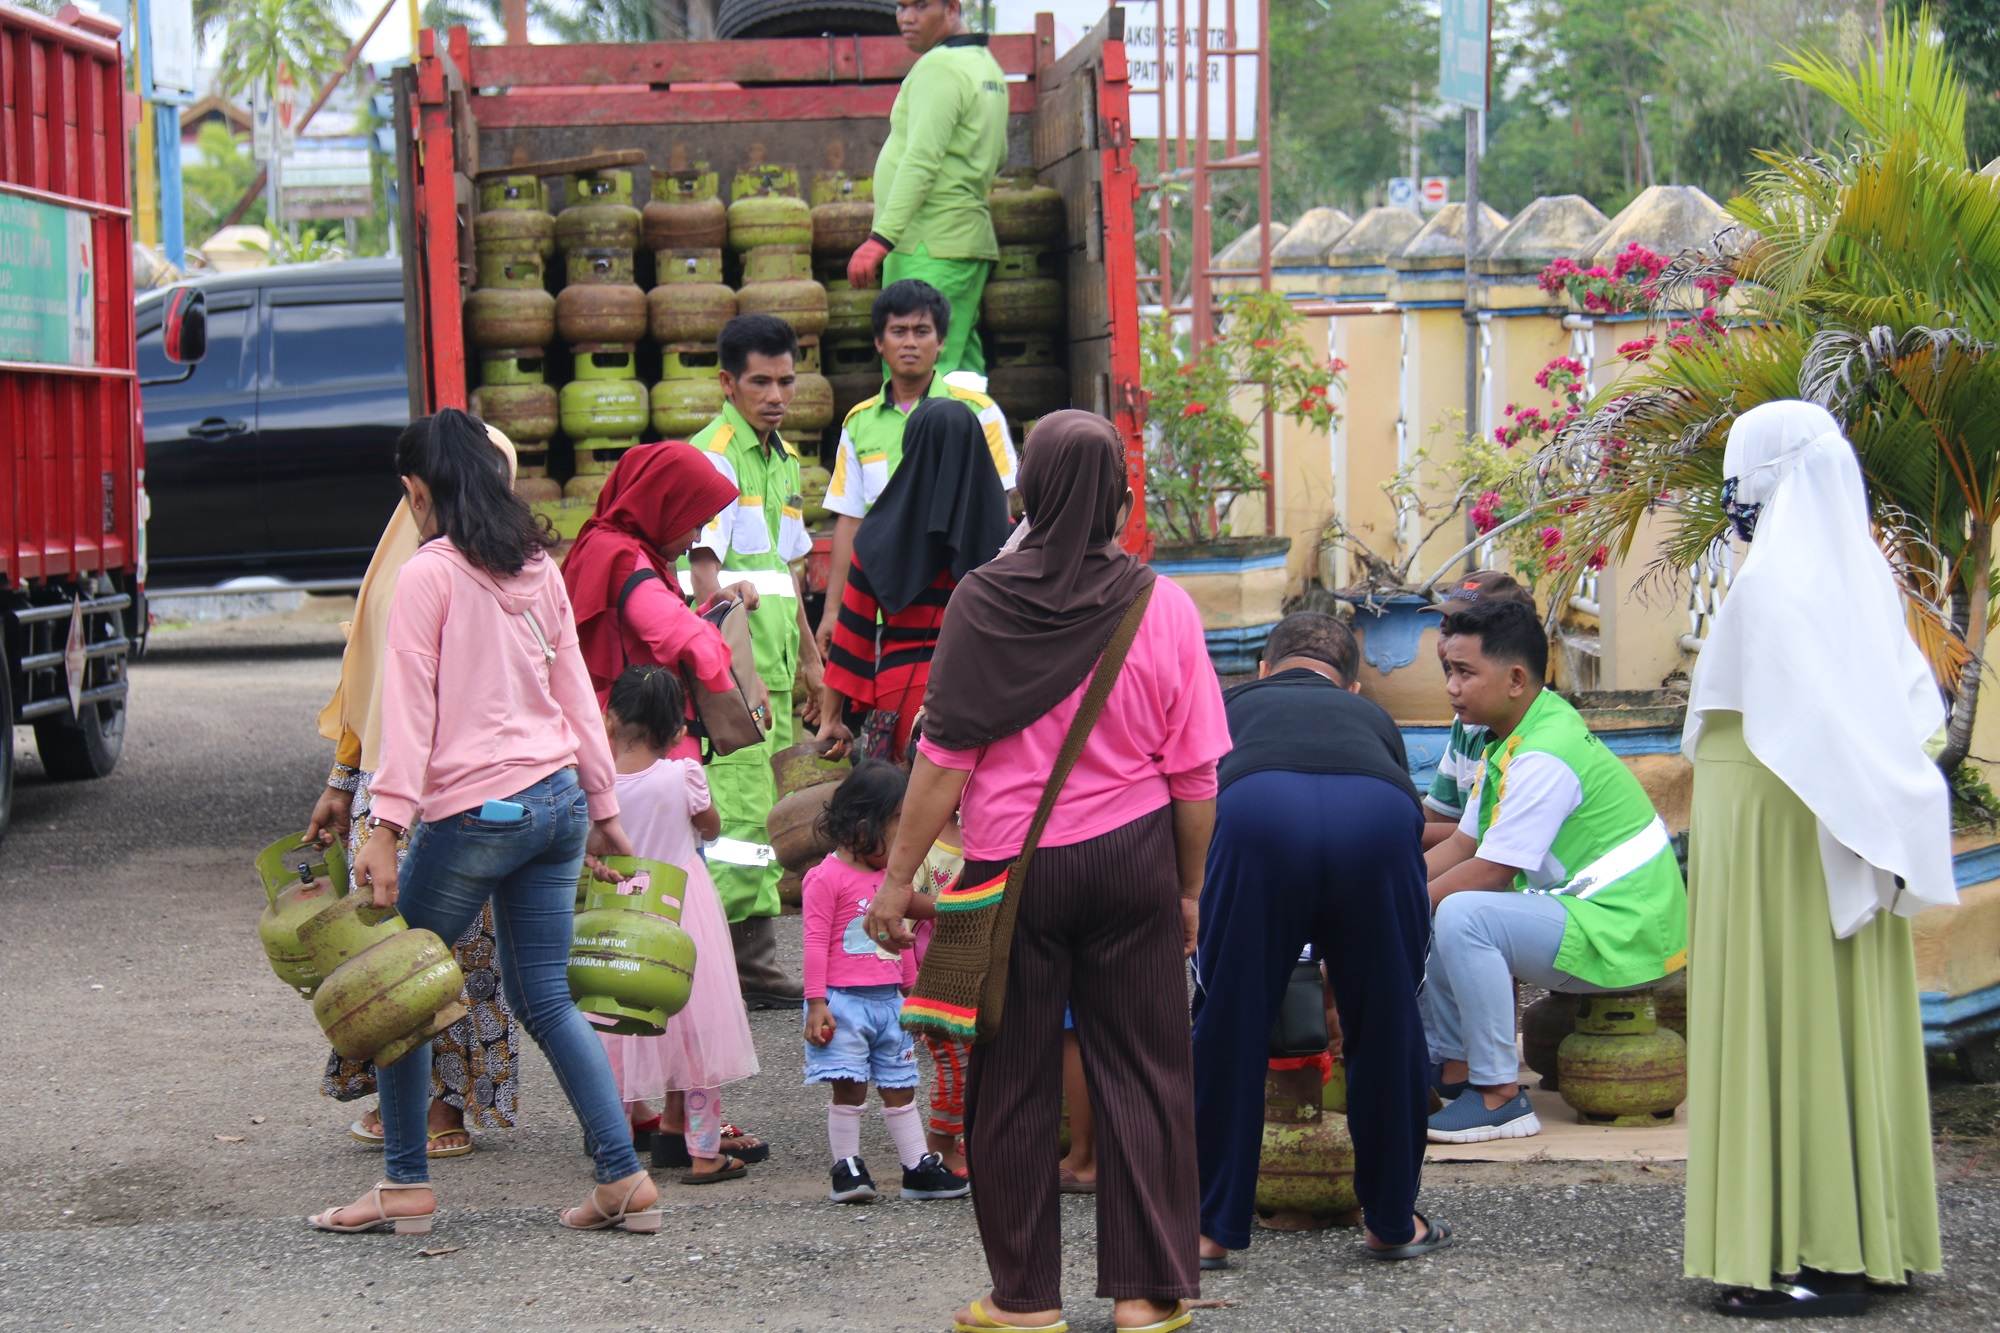 Dinas Perindusrtian Perdagangan Koperasi : Bazar Gas Elfiji 3 Kg Hanya Rp22 ribu